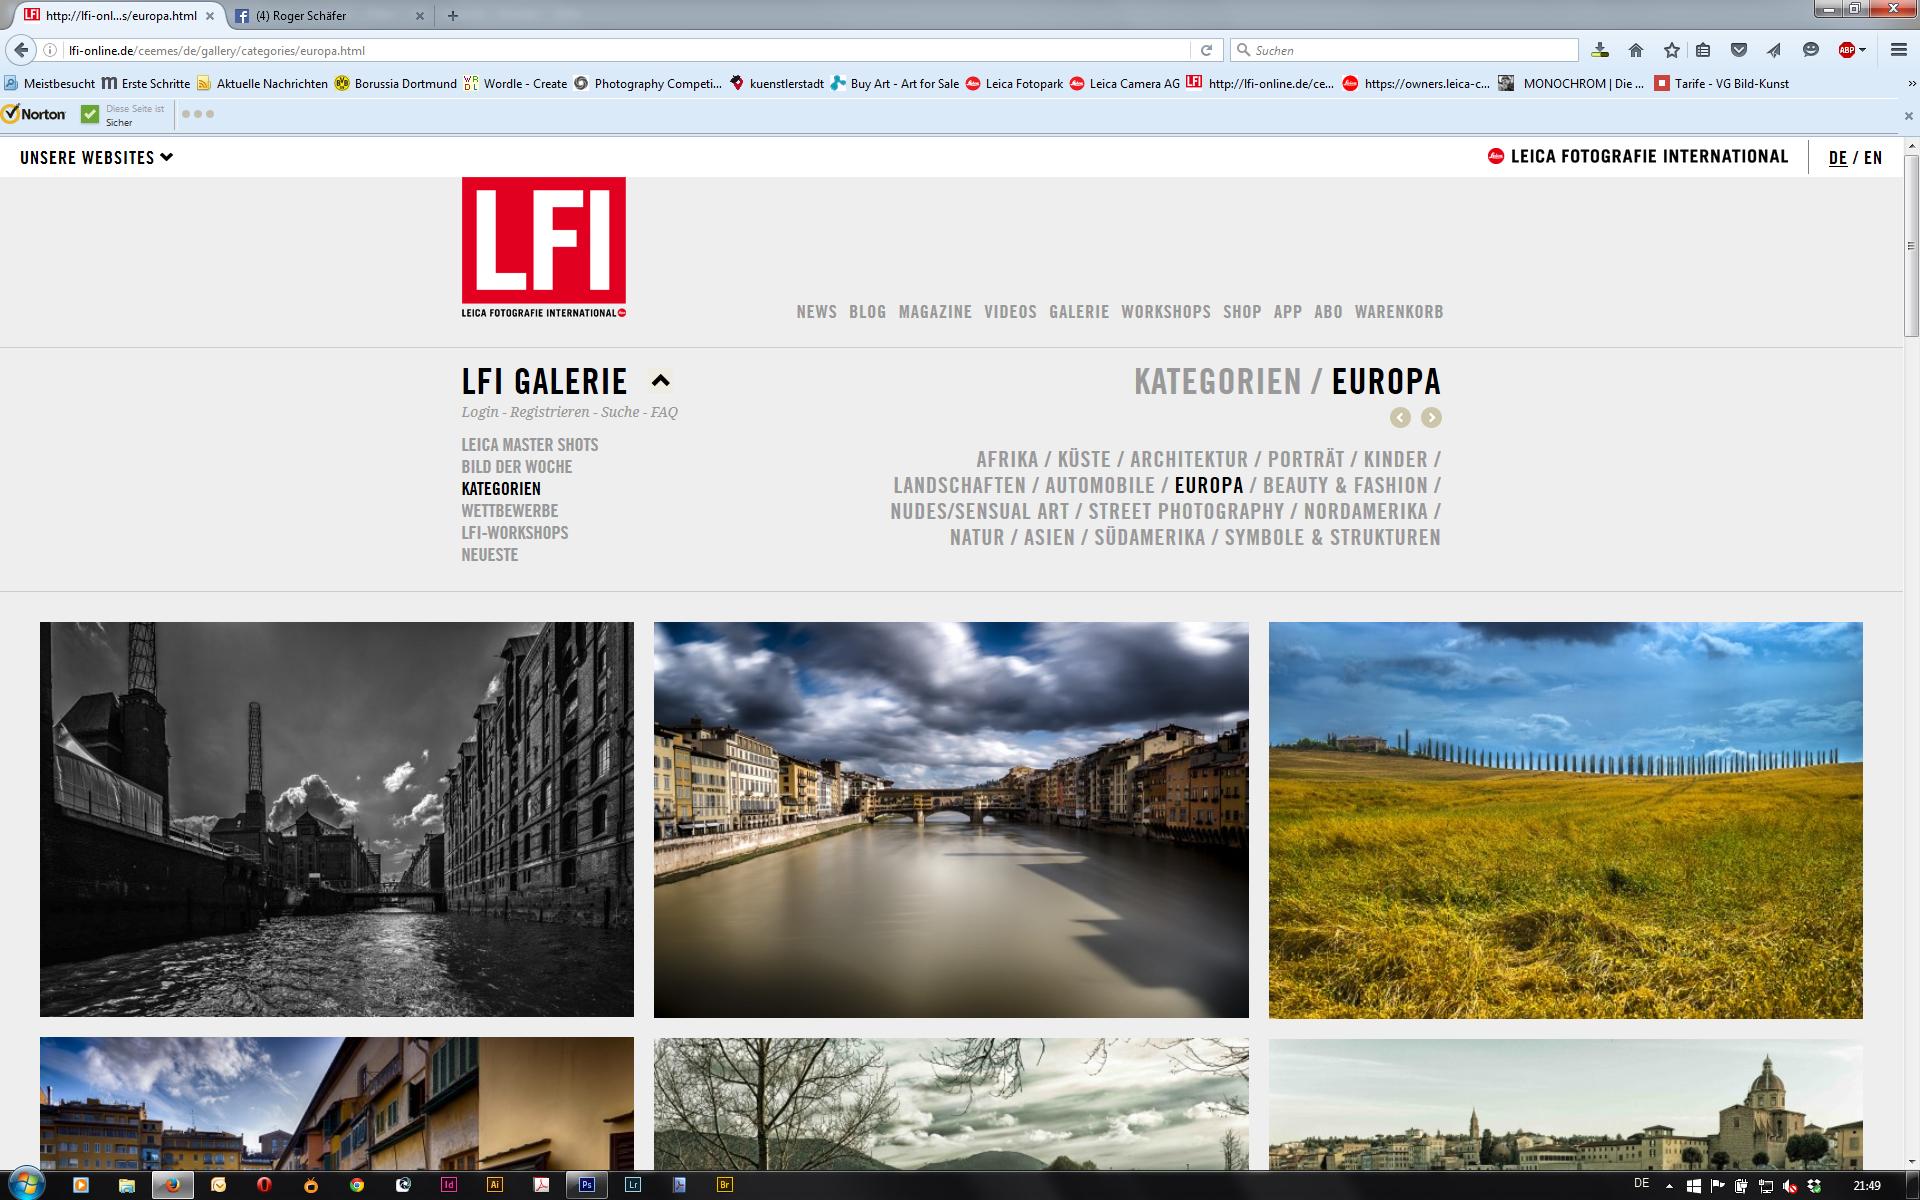 LFI_Europa_05_2016 by .